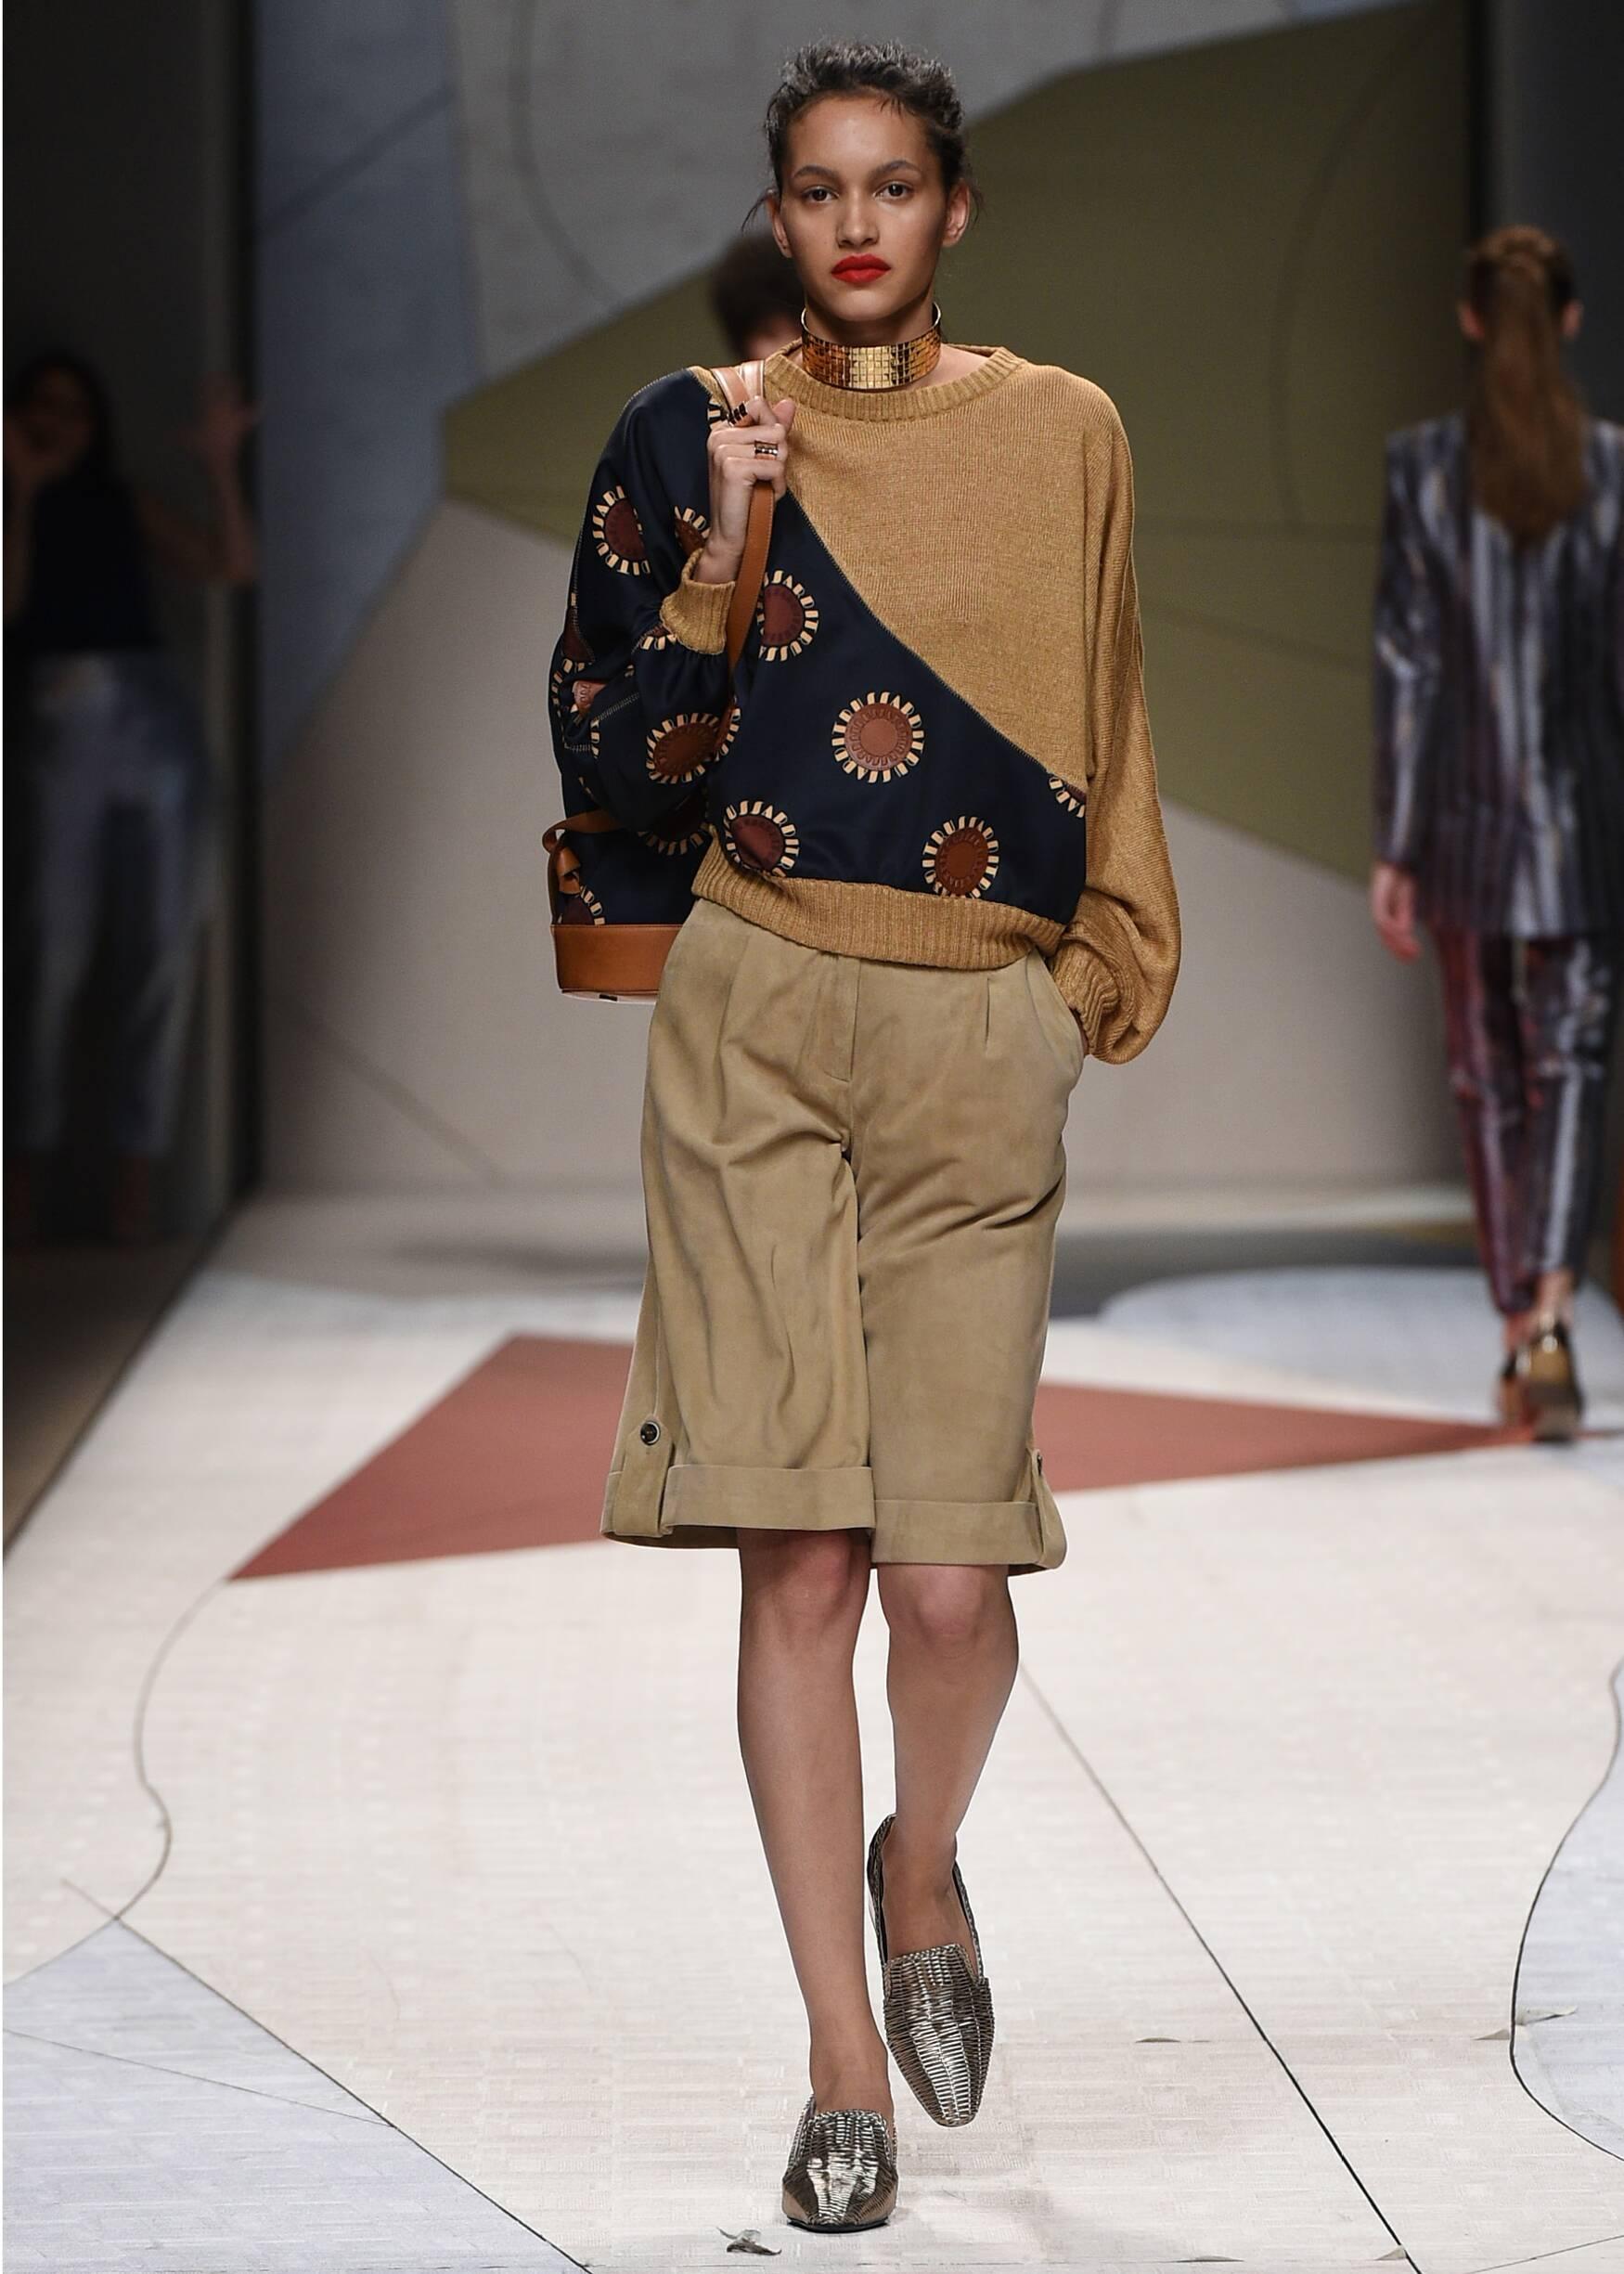 Trussardi SS 2017 Womenswear